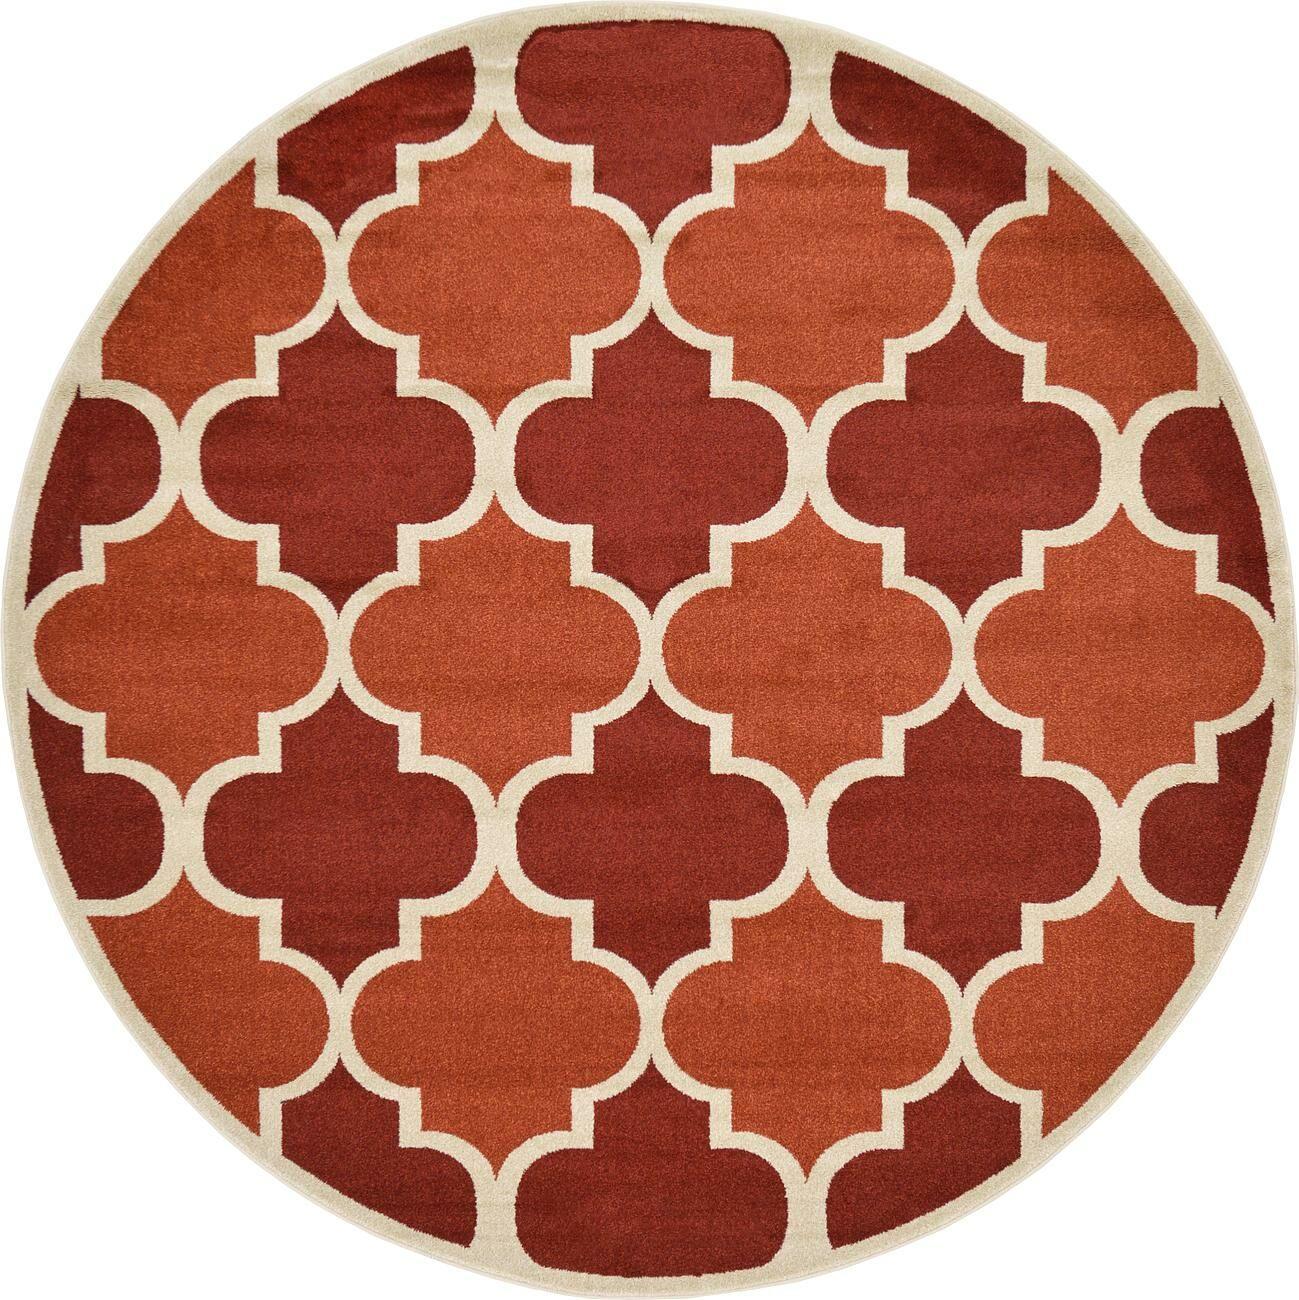 Emjay Terracotta Area Rug Rug Size: Round 8'